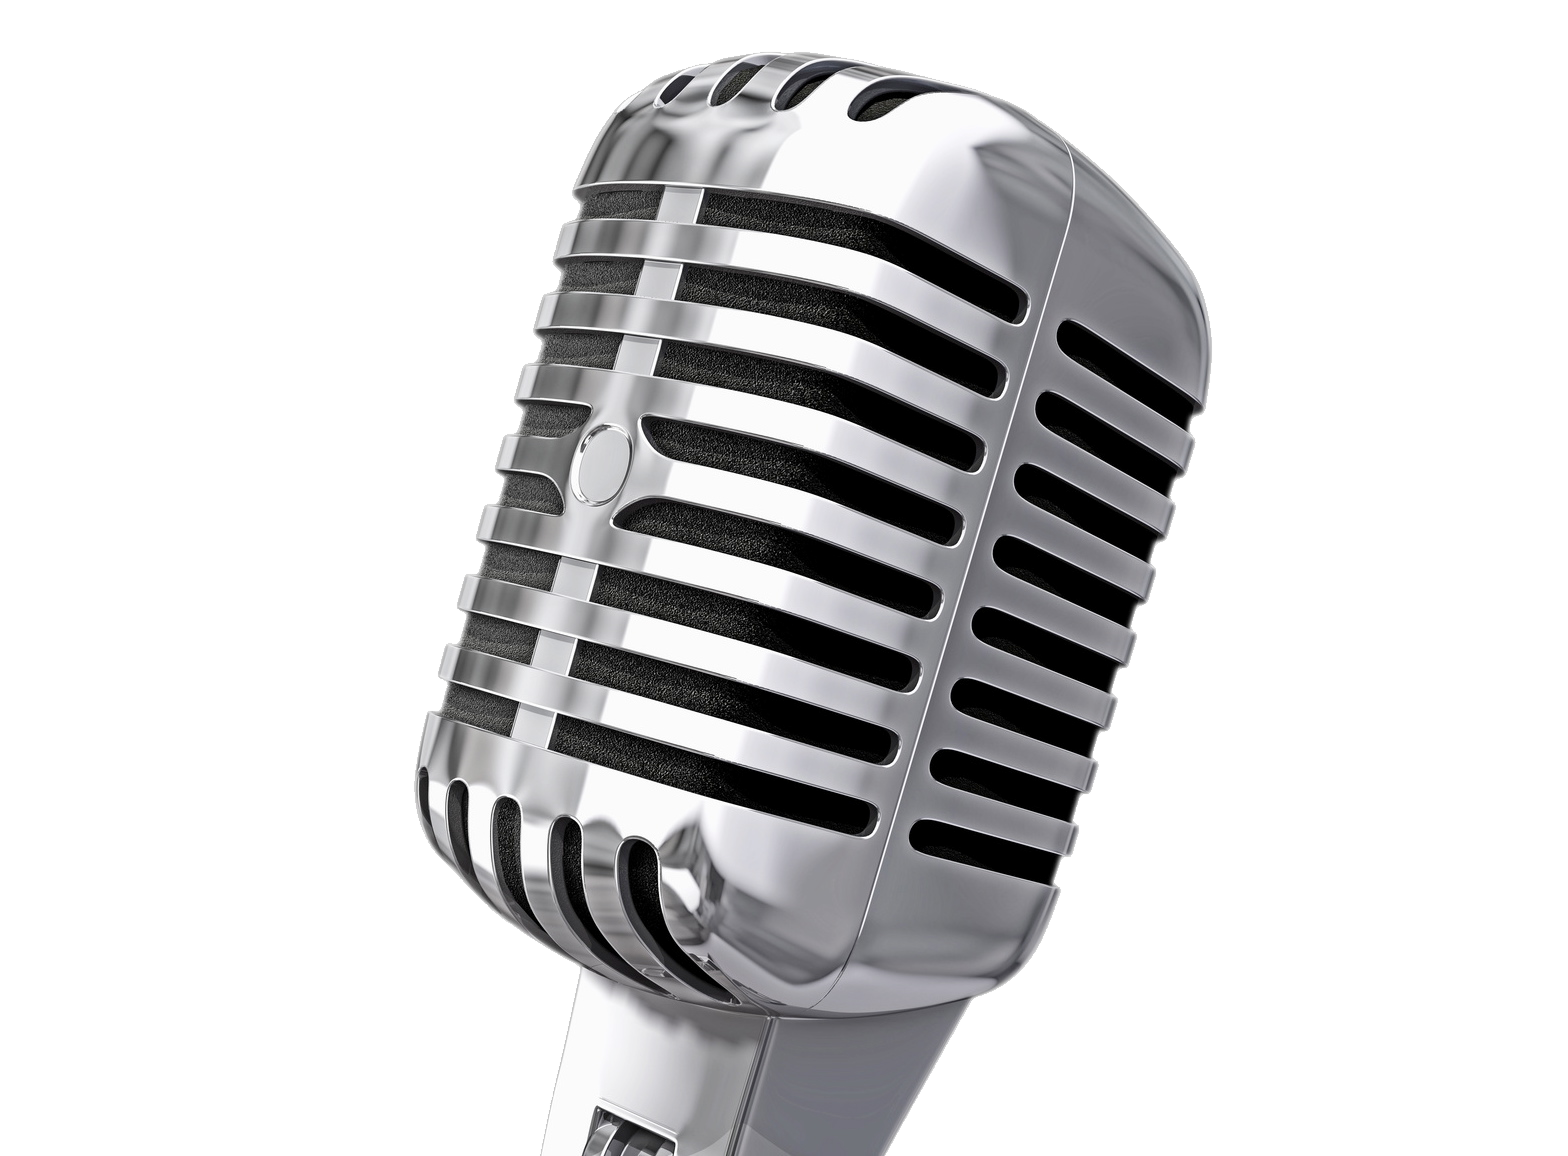 Microphone PNG Image Microphone, Vintage microphone